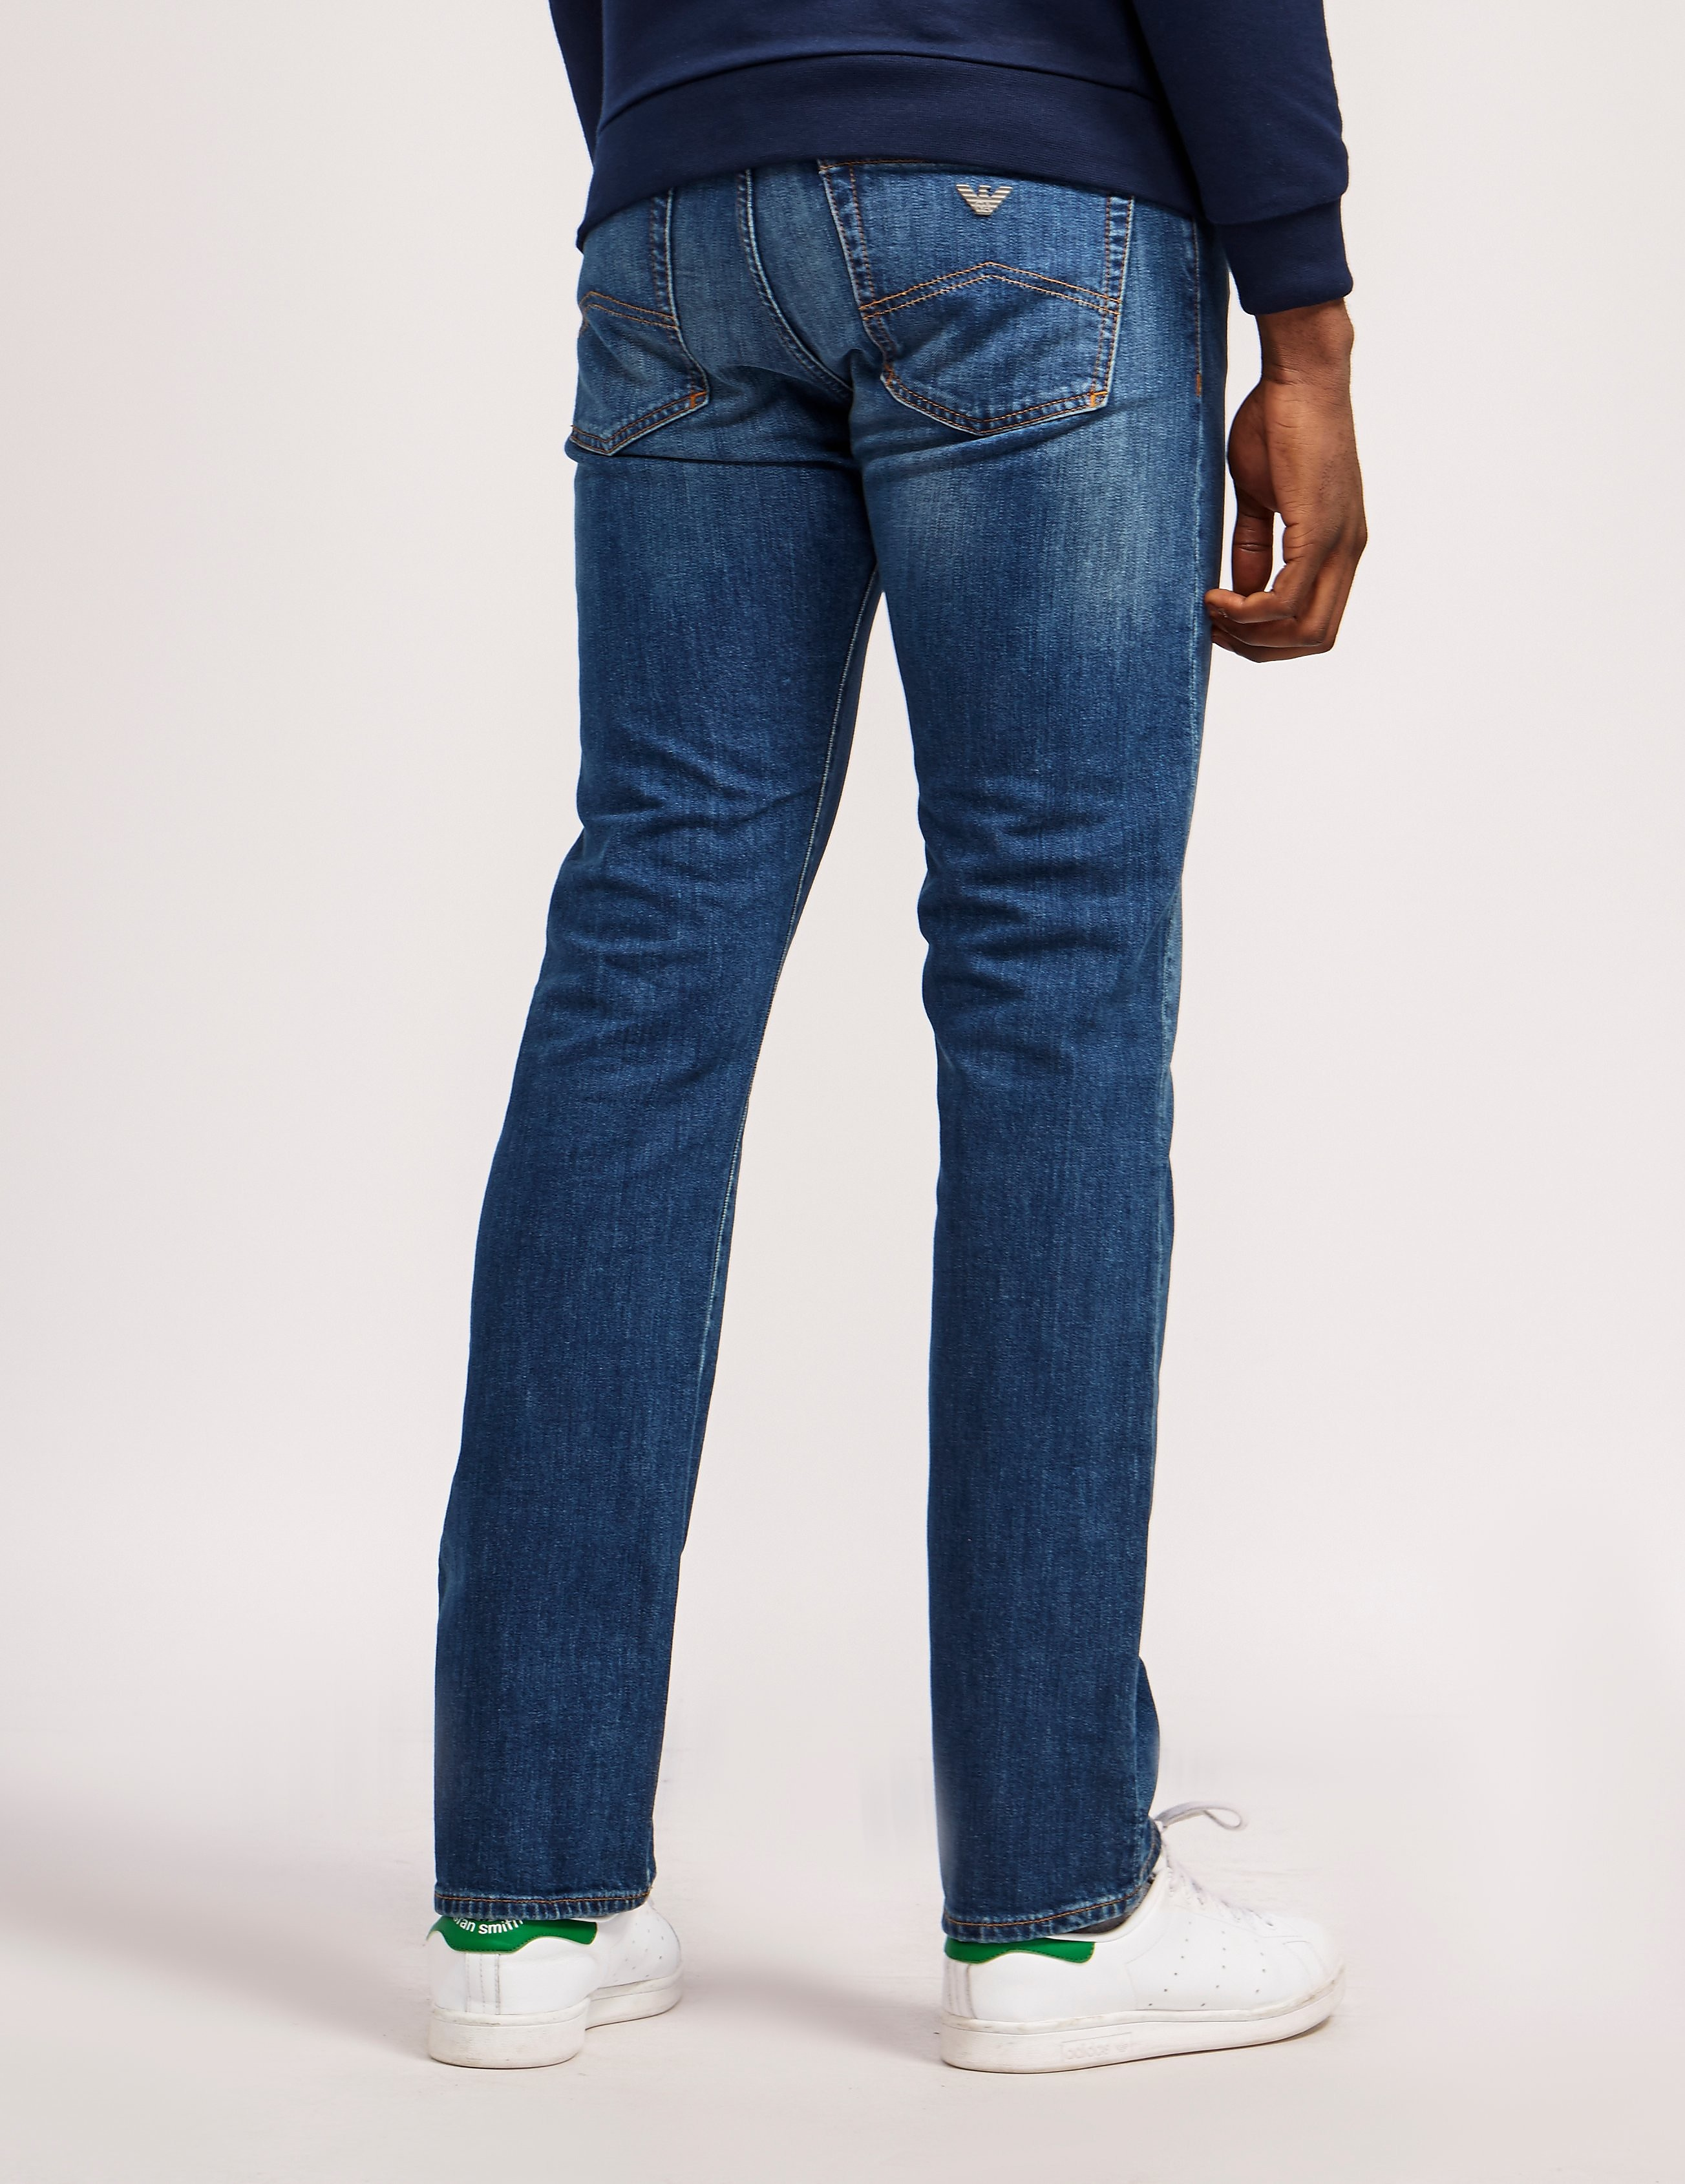 Armani Jeans J21 Short Jean